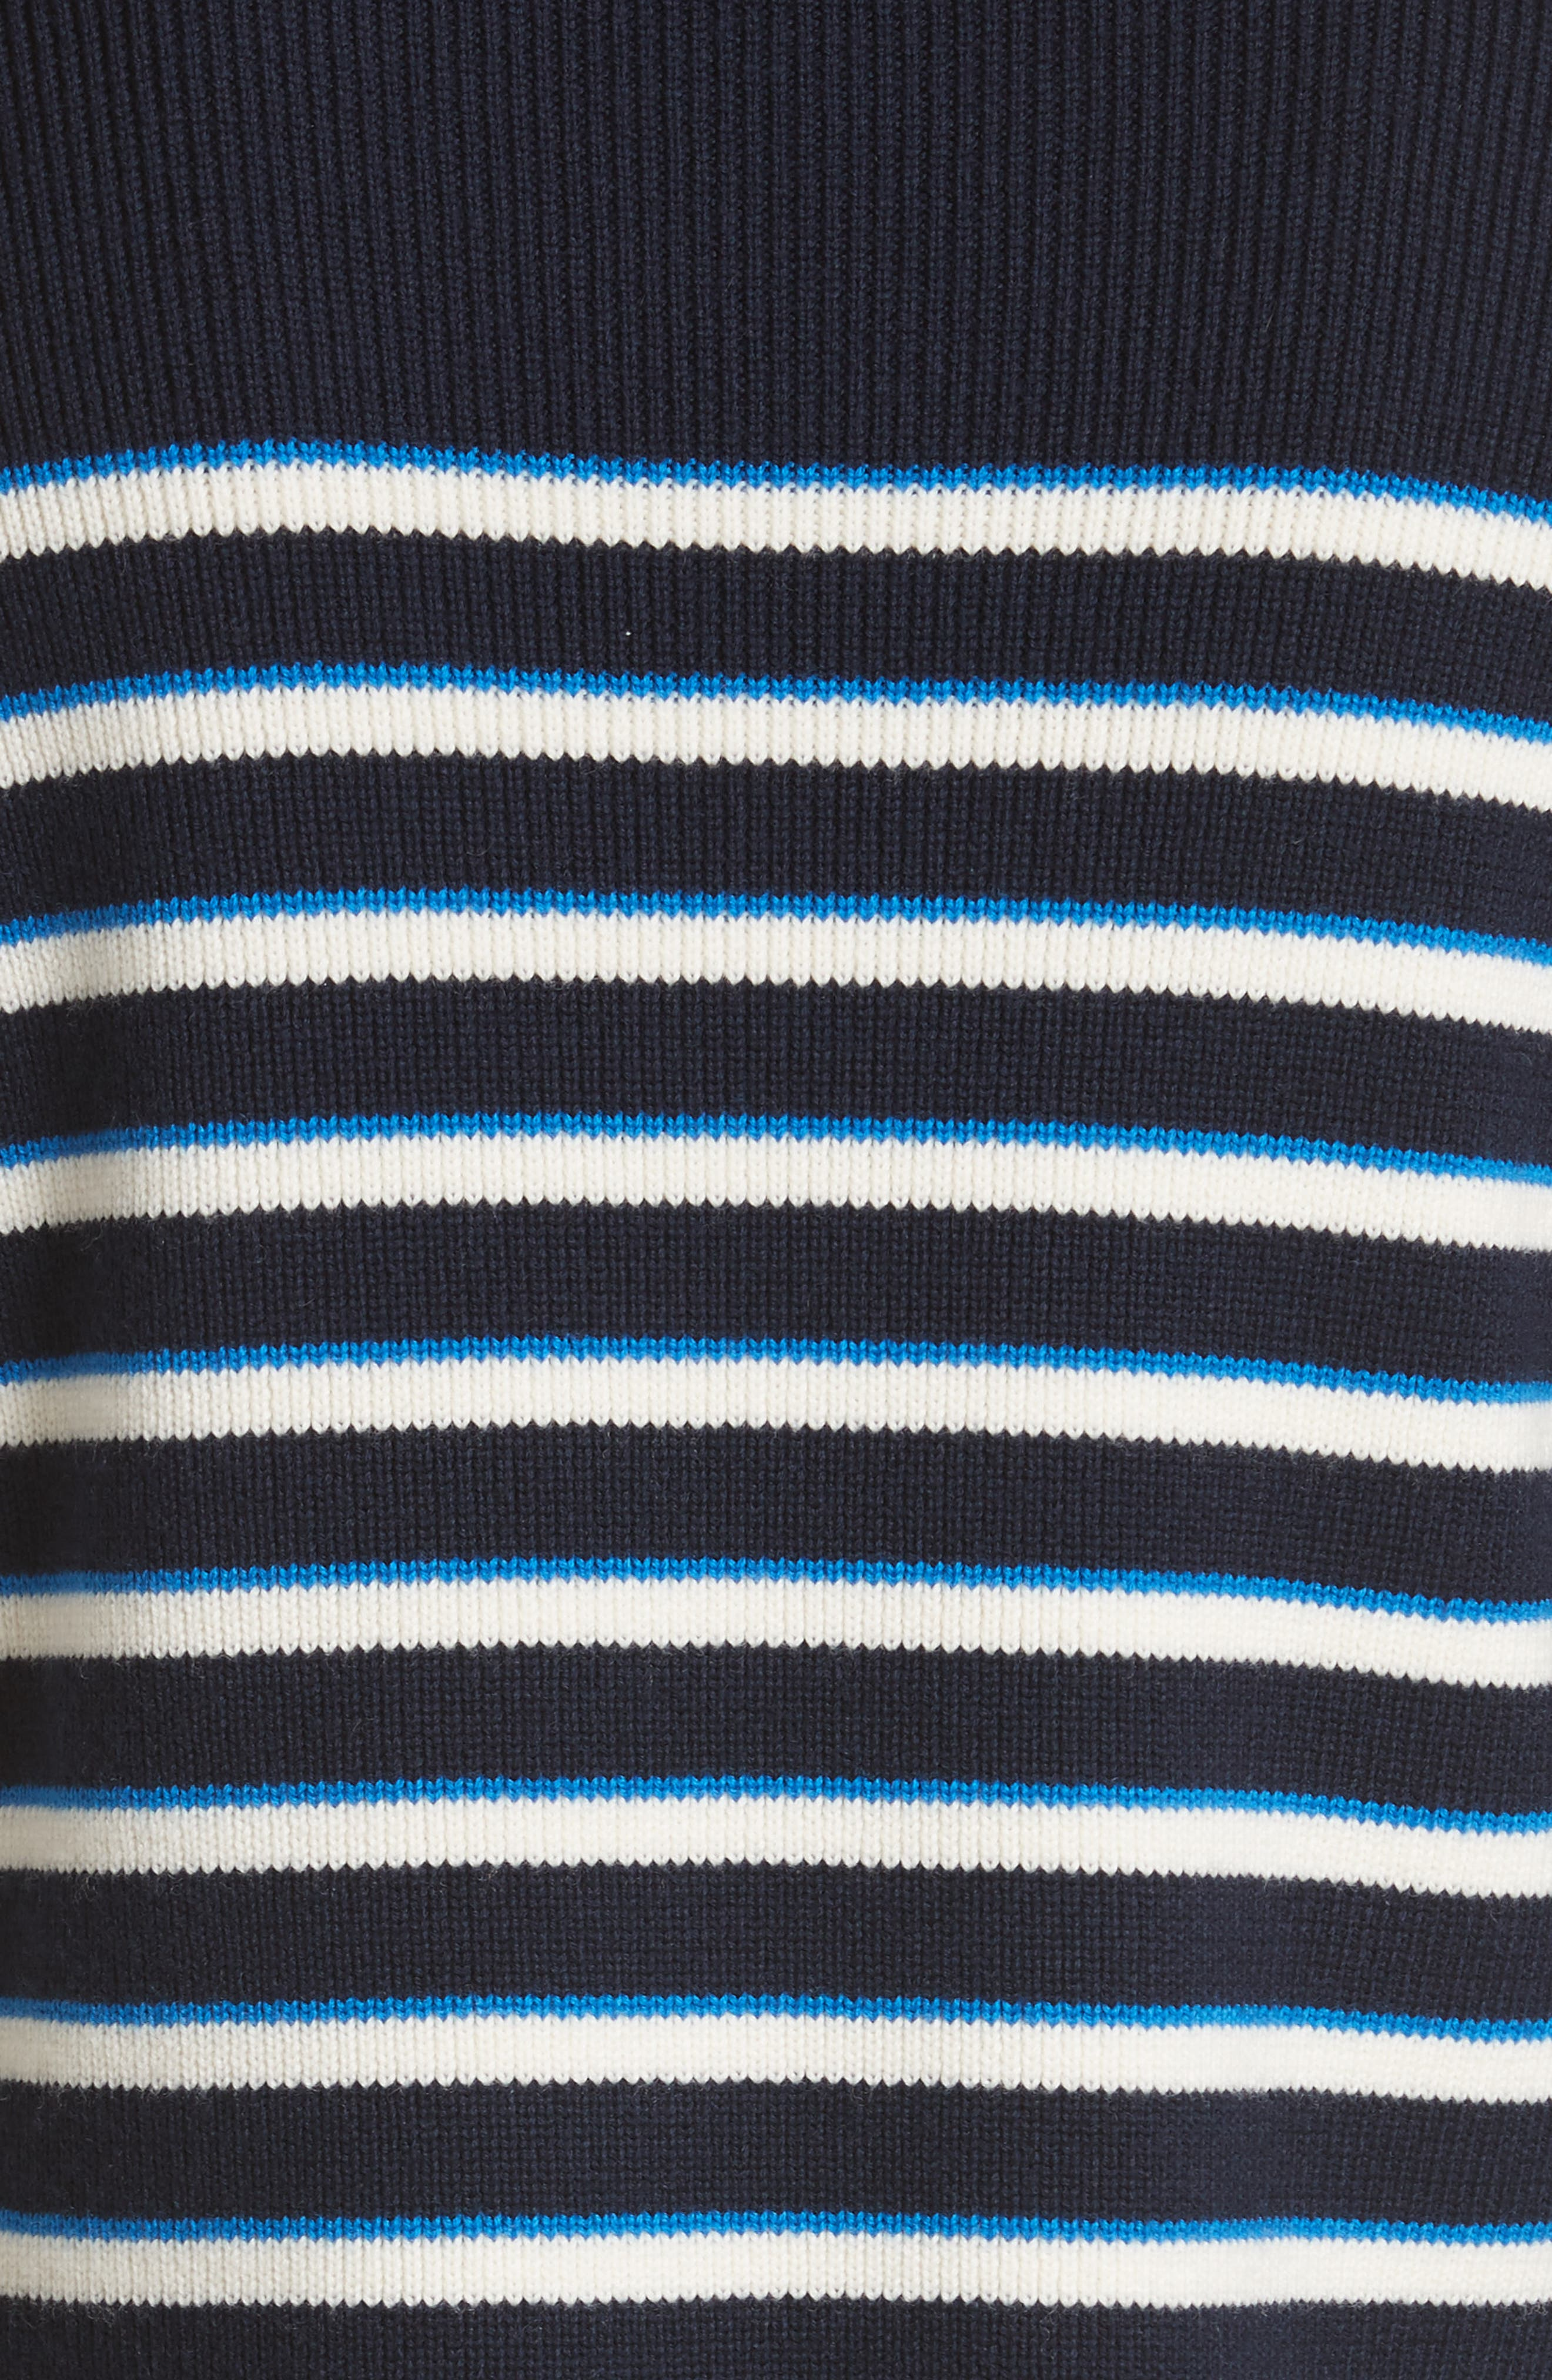 Amos Stripe Merino Wool Sweater,                             Alternate thumbnail 5, color,                             Navy/ Ivory/ Blue